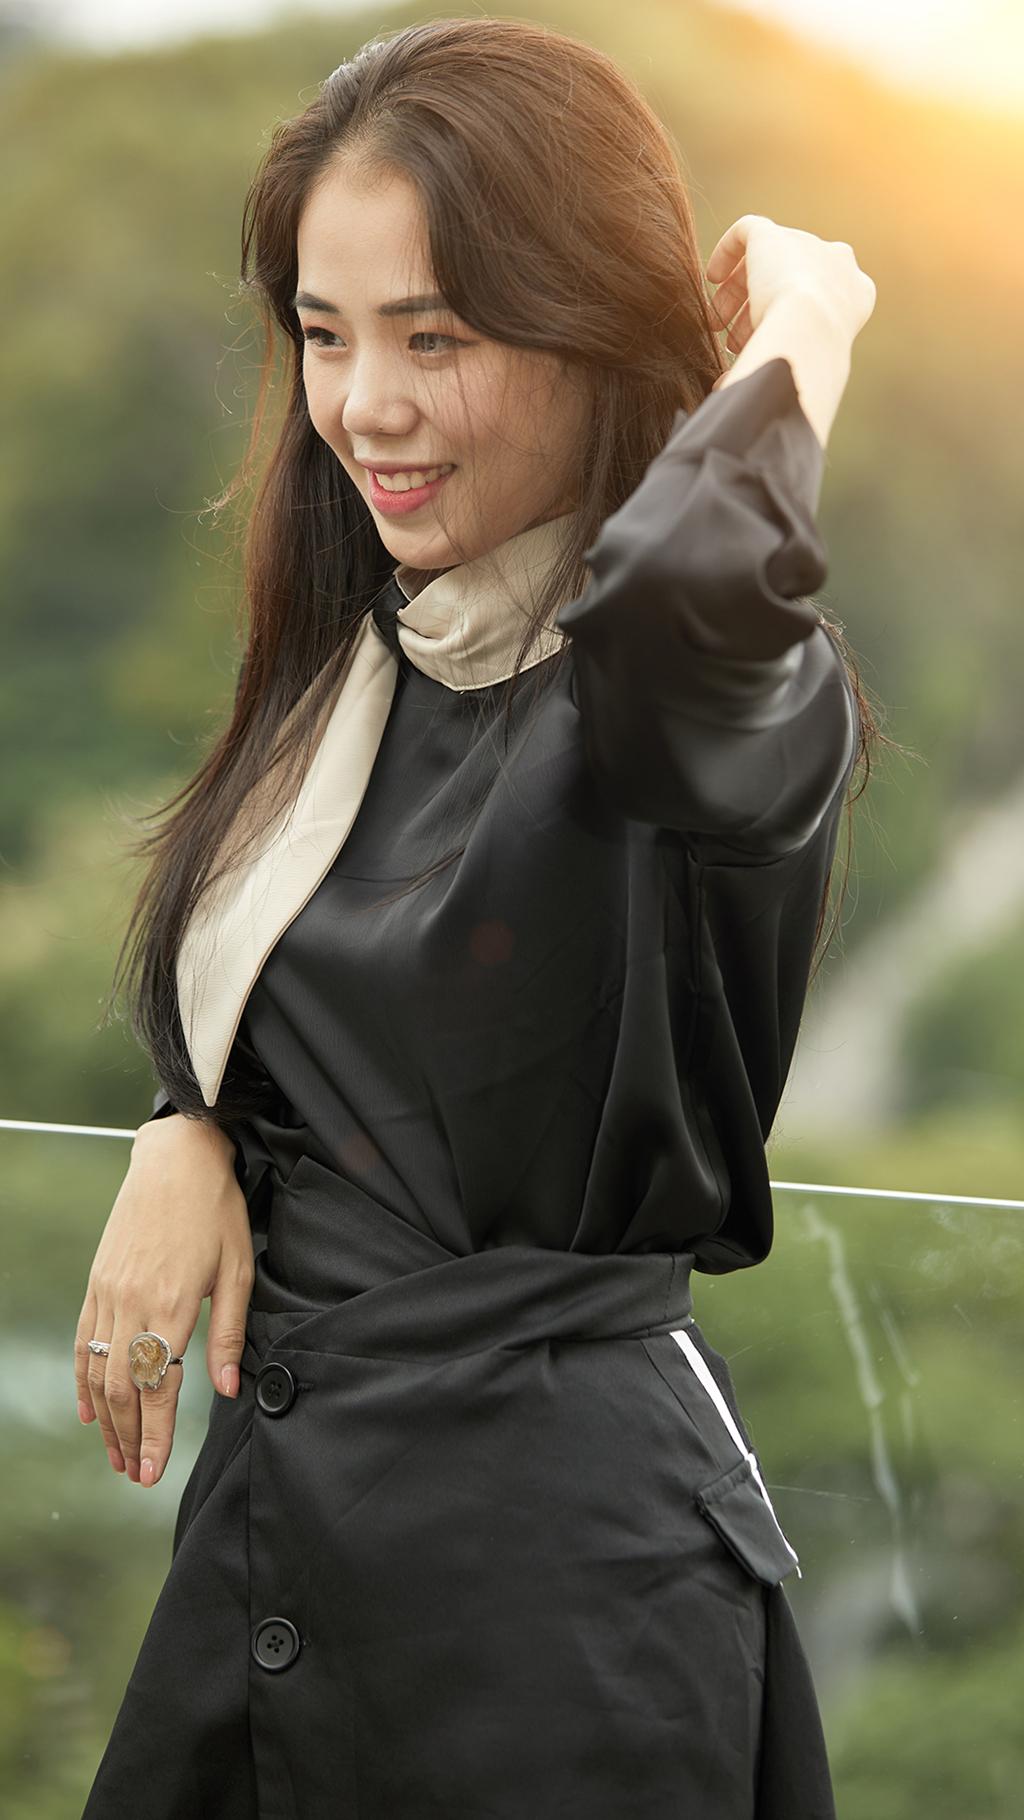 Hien tuong cover Huong Ly co chong nam 21 tuoi, bi don la me don than hinh anh 2